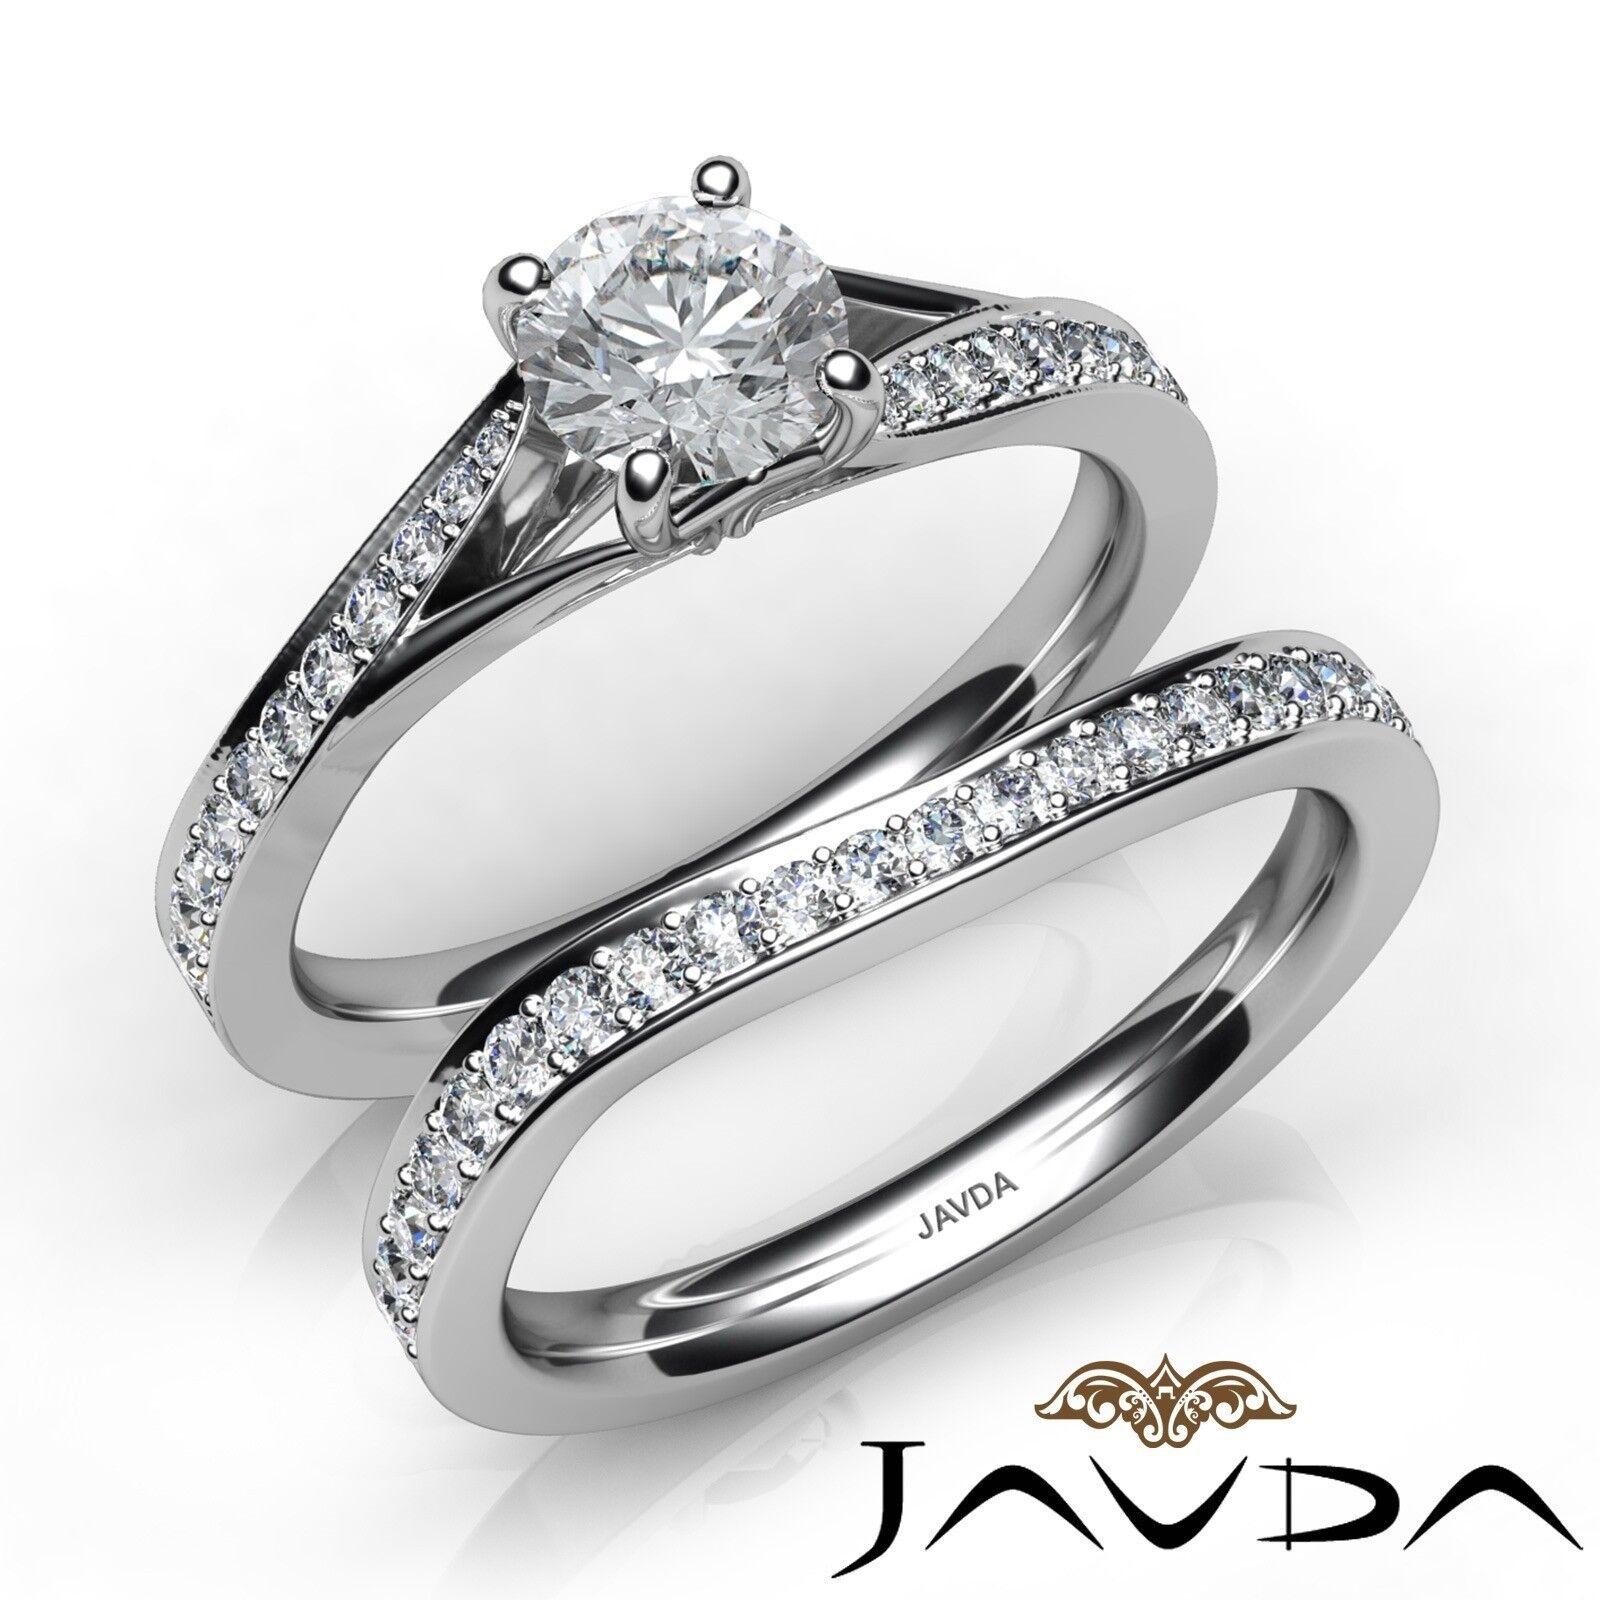 1.35ctw Sidestone Bridal Set Round Diamond Engagement Ring GIA E-VVS2 White Gold